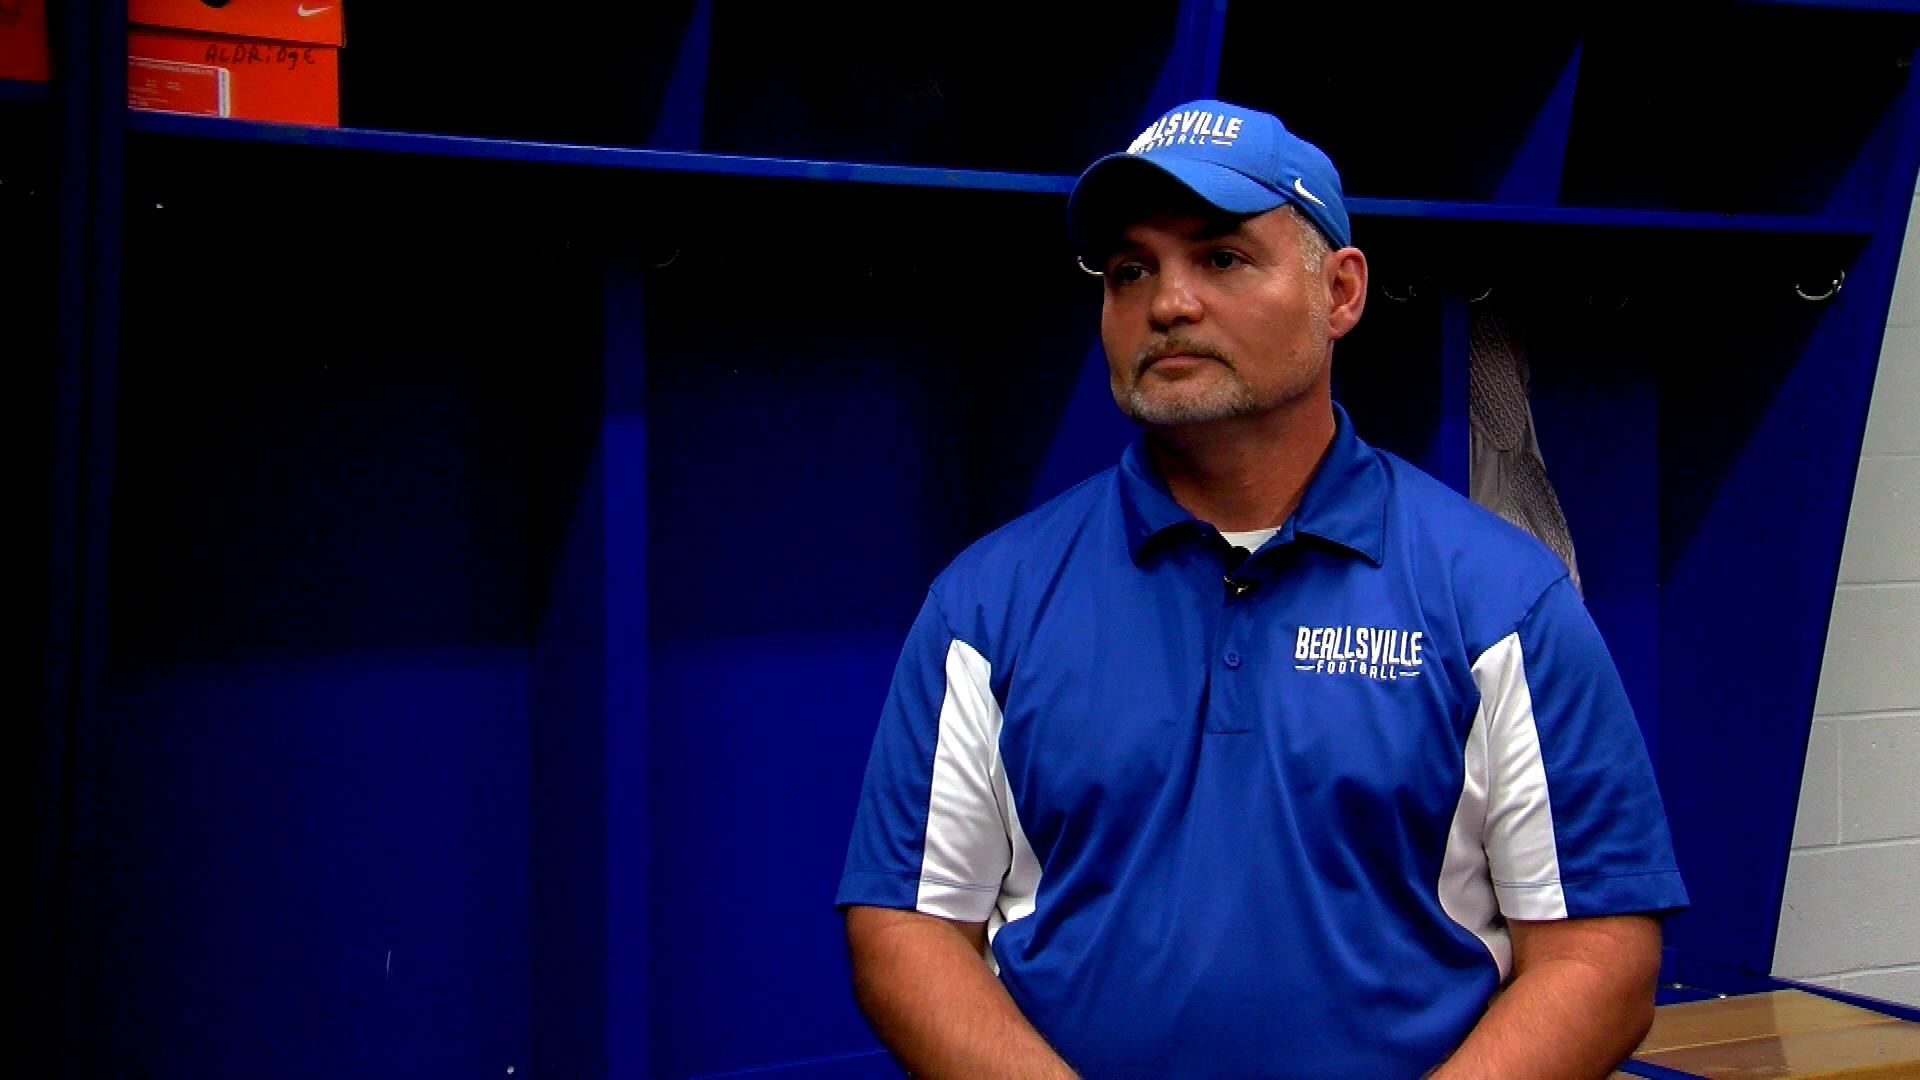 Coach Larry Deem